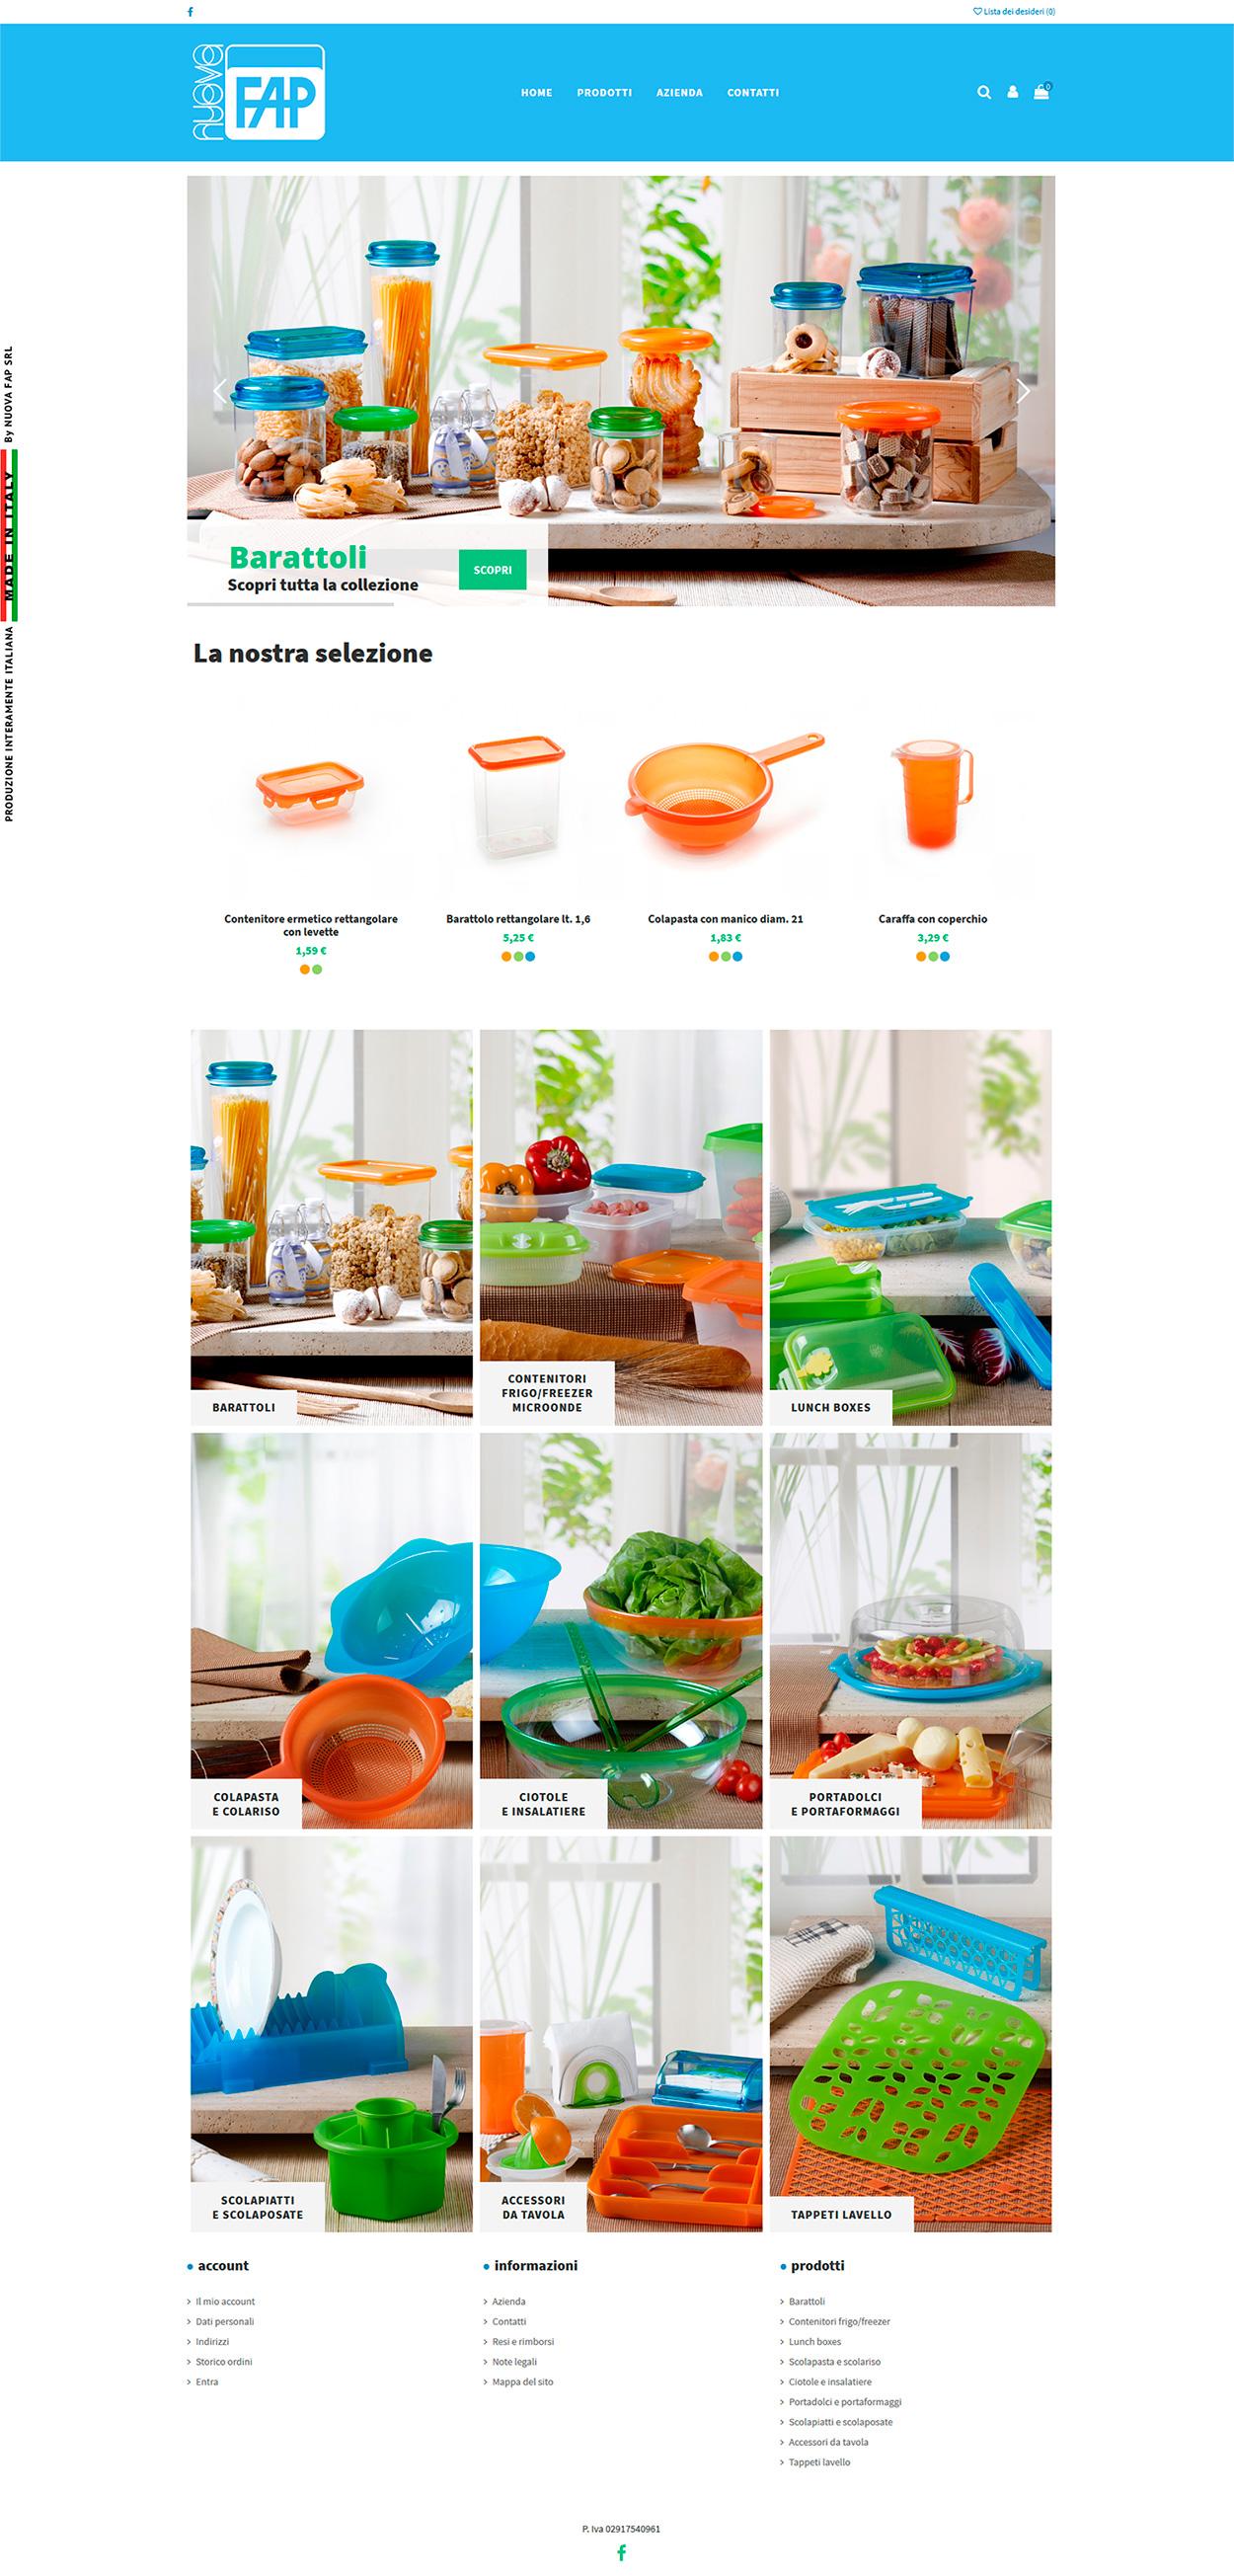 nuovafap online shop